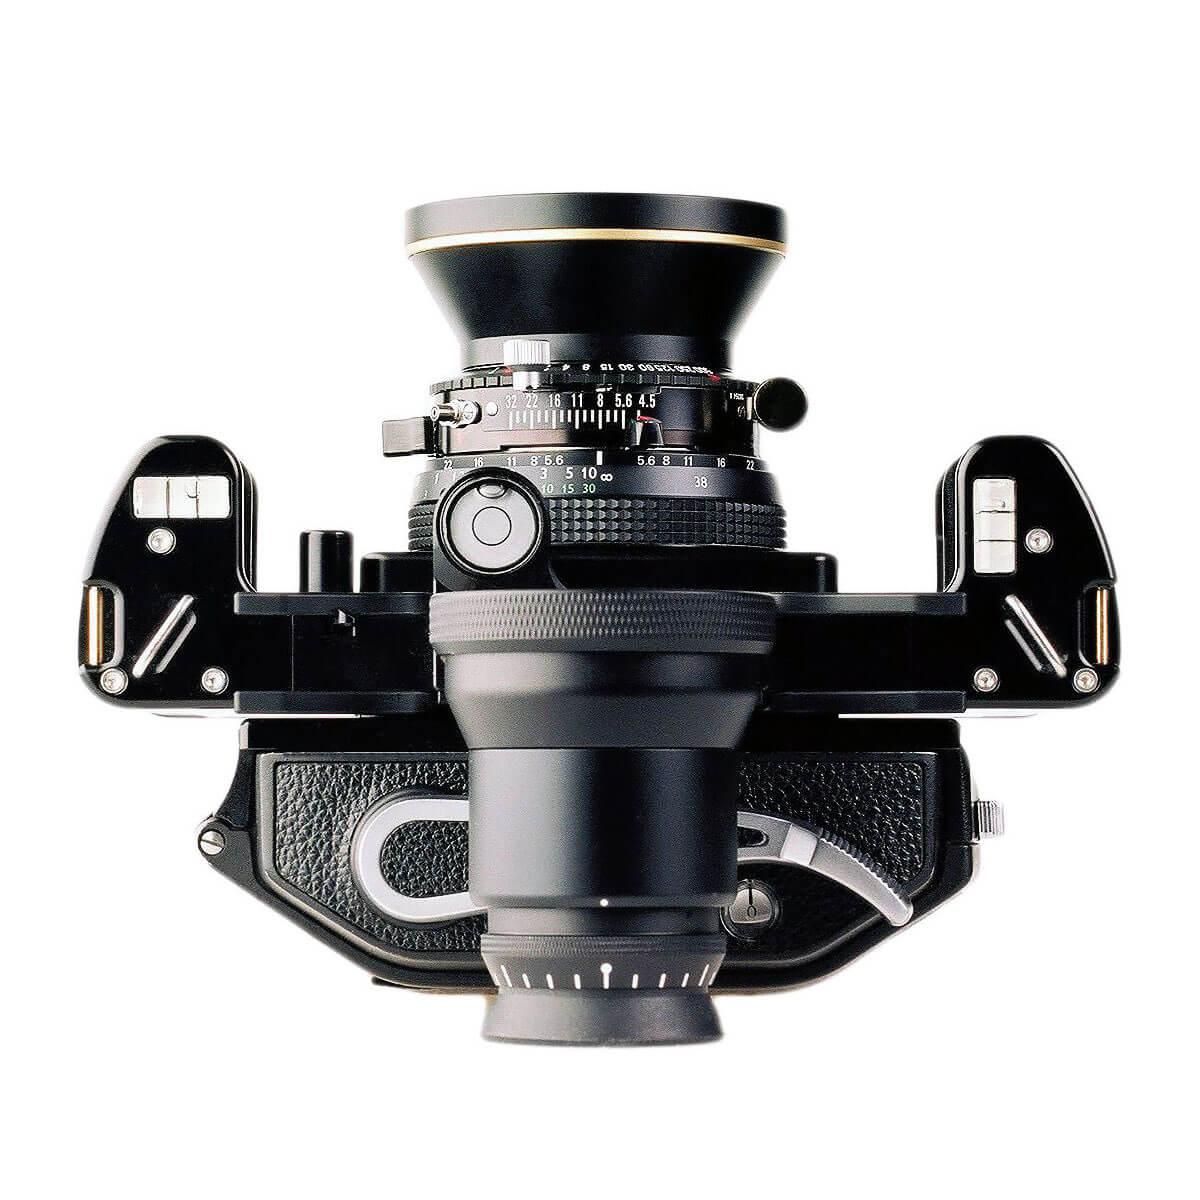 ALPA Biogon 4.5/38 mm